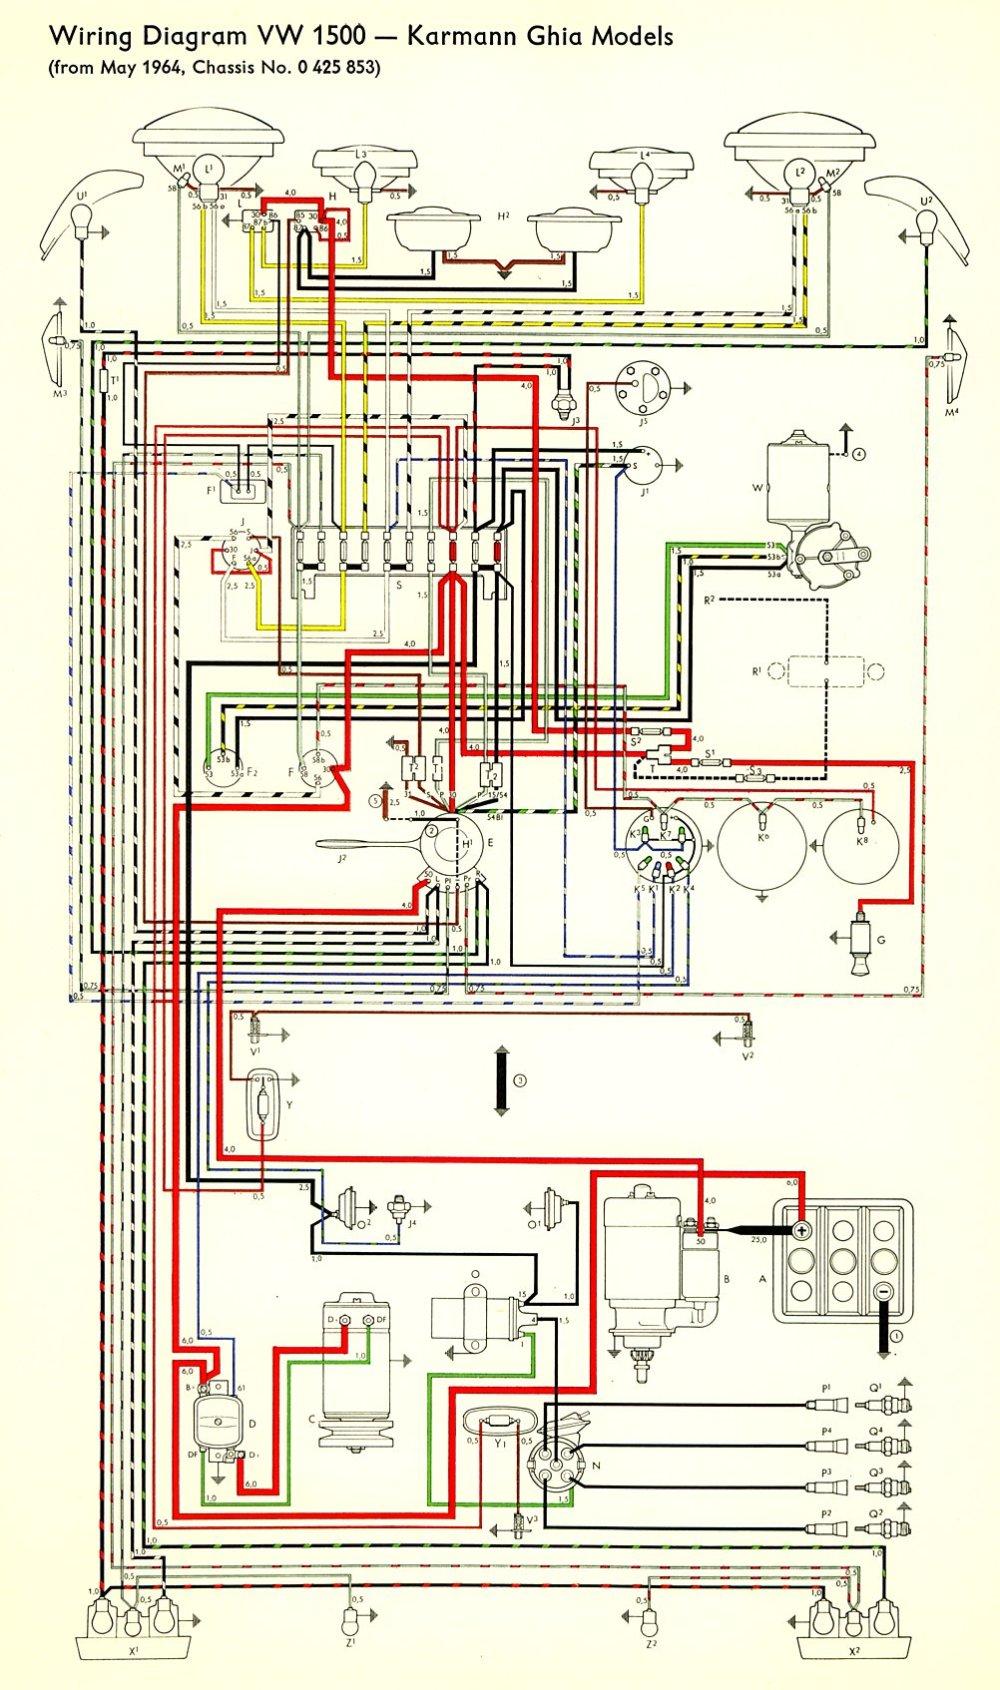 medium resolution of 1964 volkswagen wiring diagram 1964 free engine image 1964 vw beetle wiring diagram 1967 vw wiring